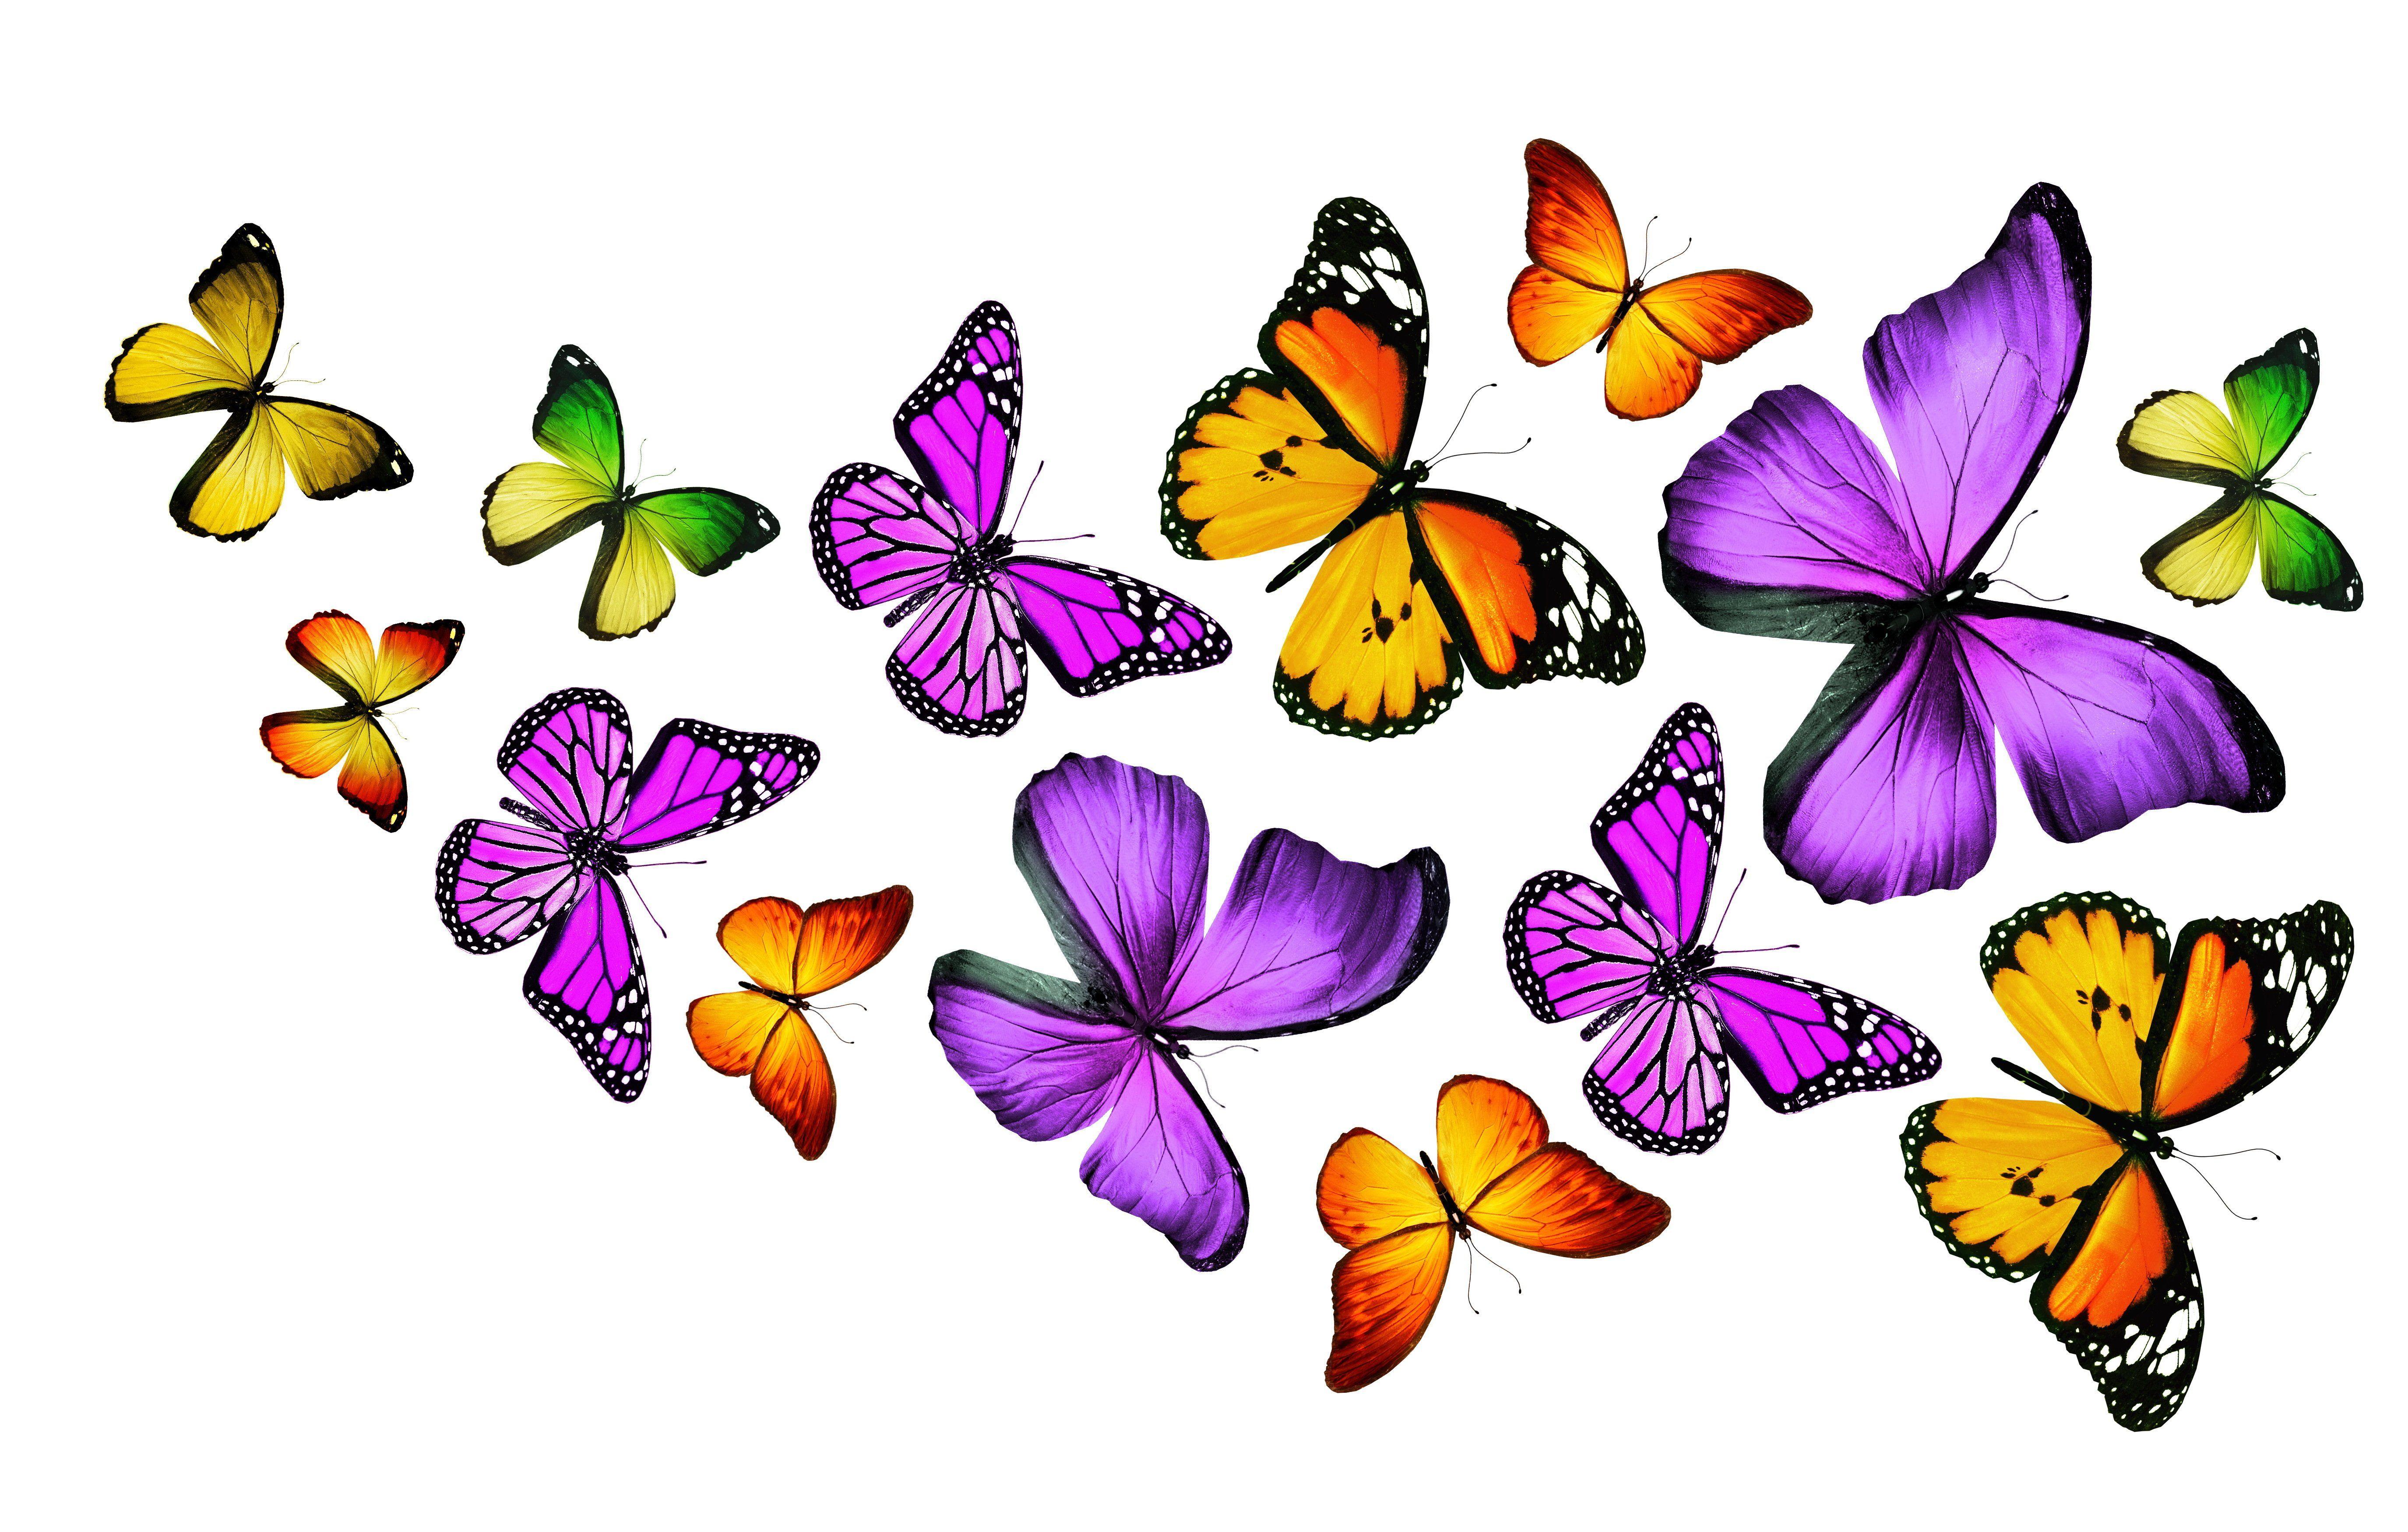 Purple Butterfly Backgrounds Butterfly background Background hd